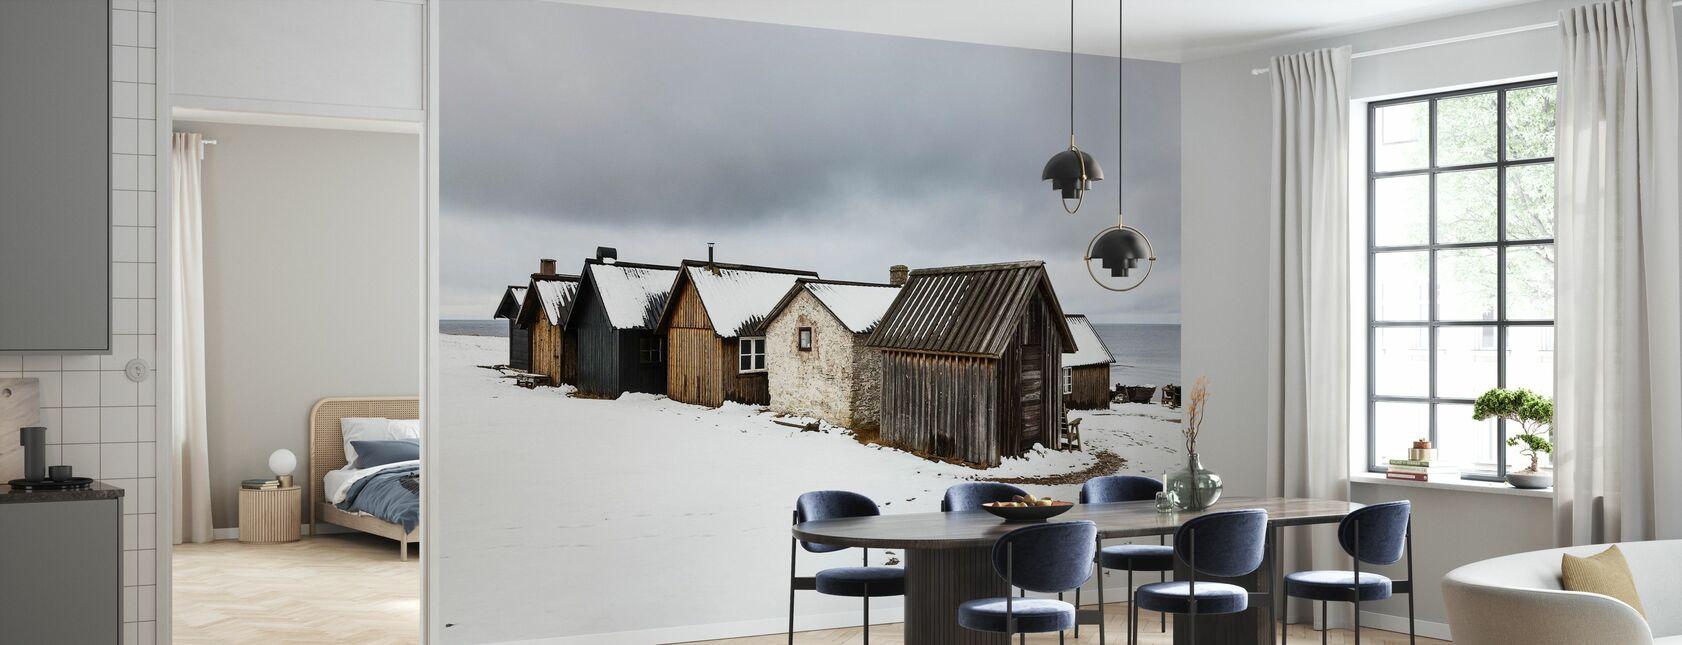 Helgumannens Fishing Village - Wallpaper - Kitchen